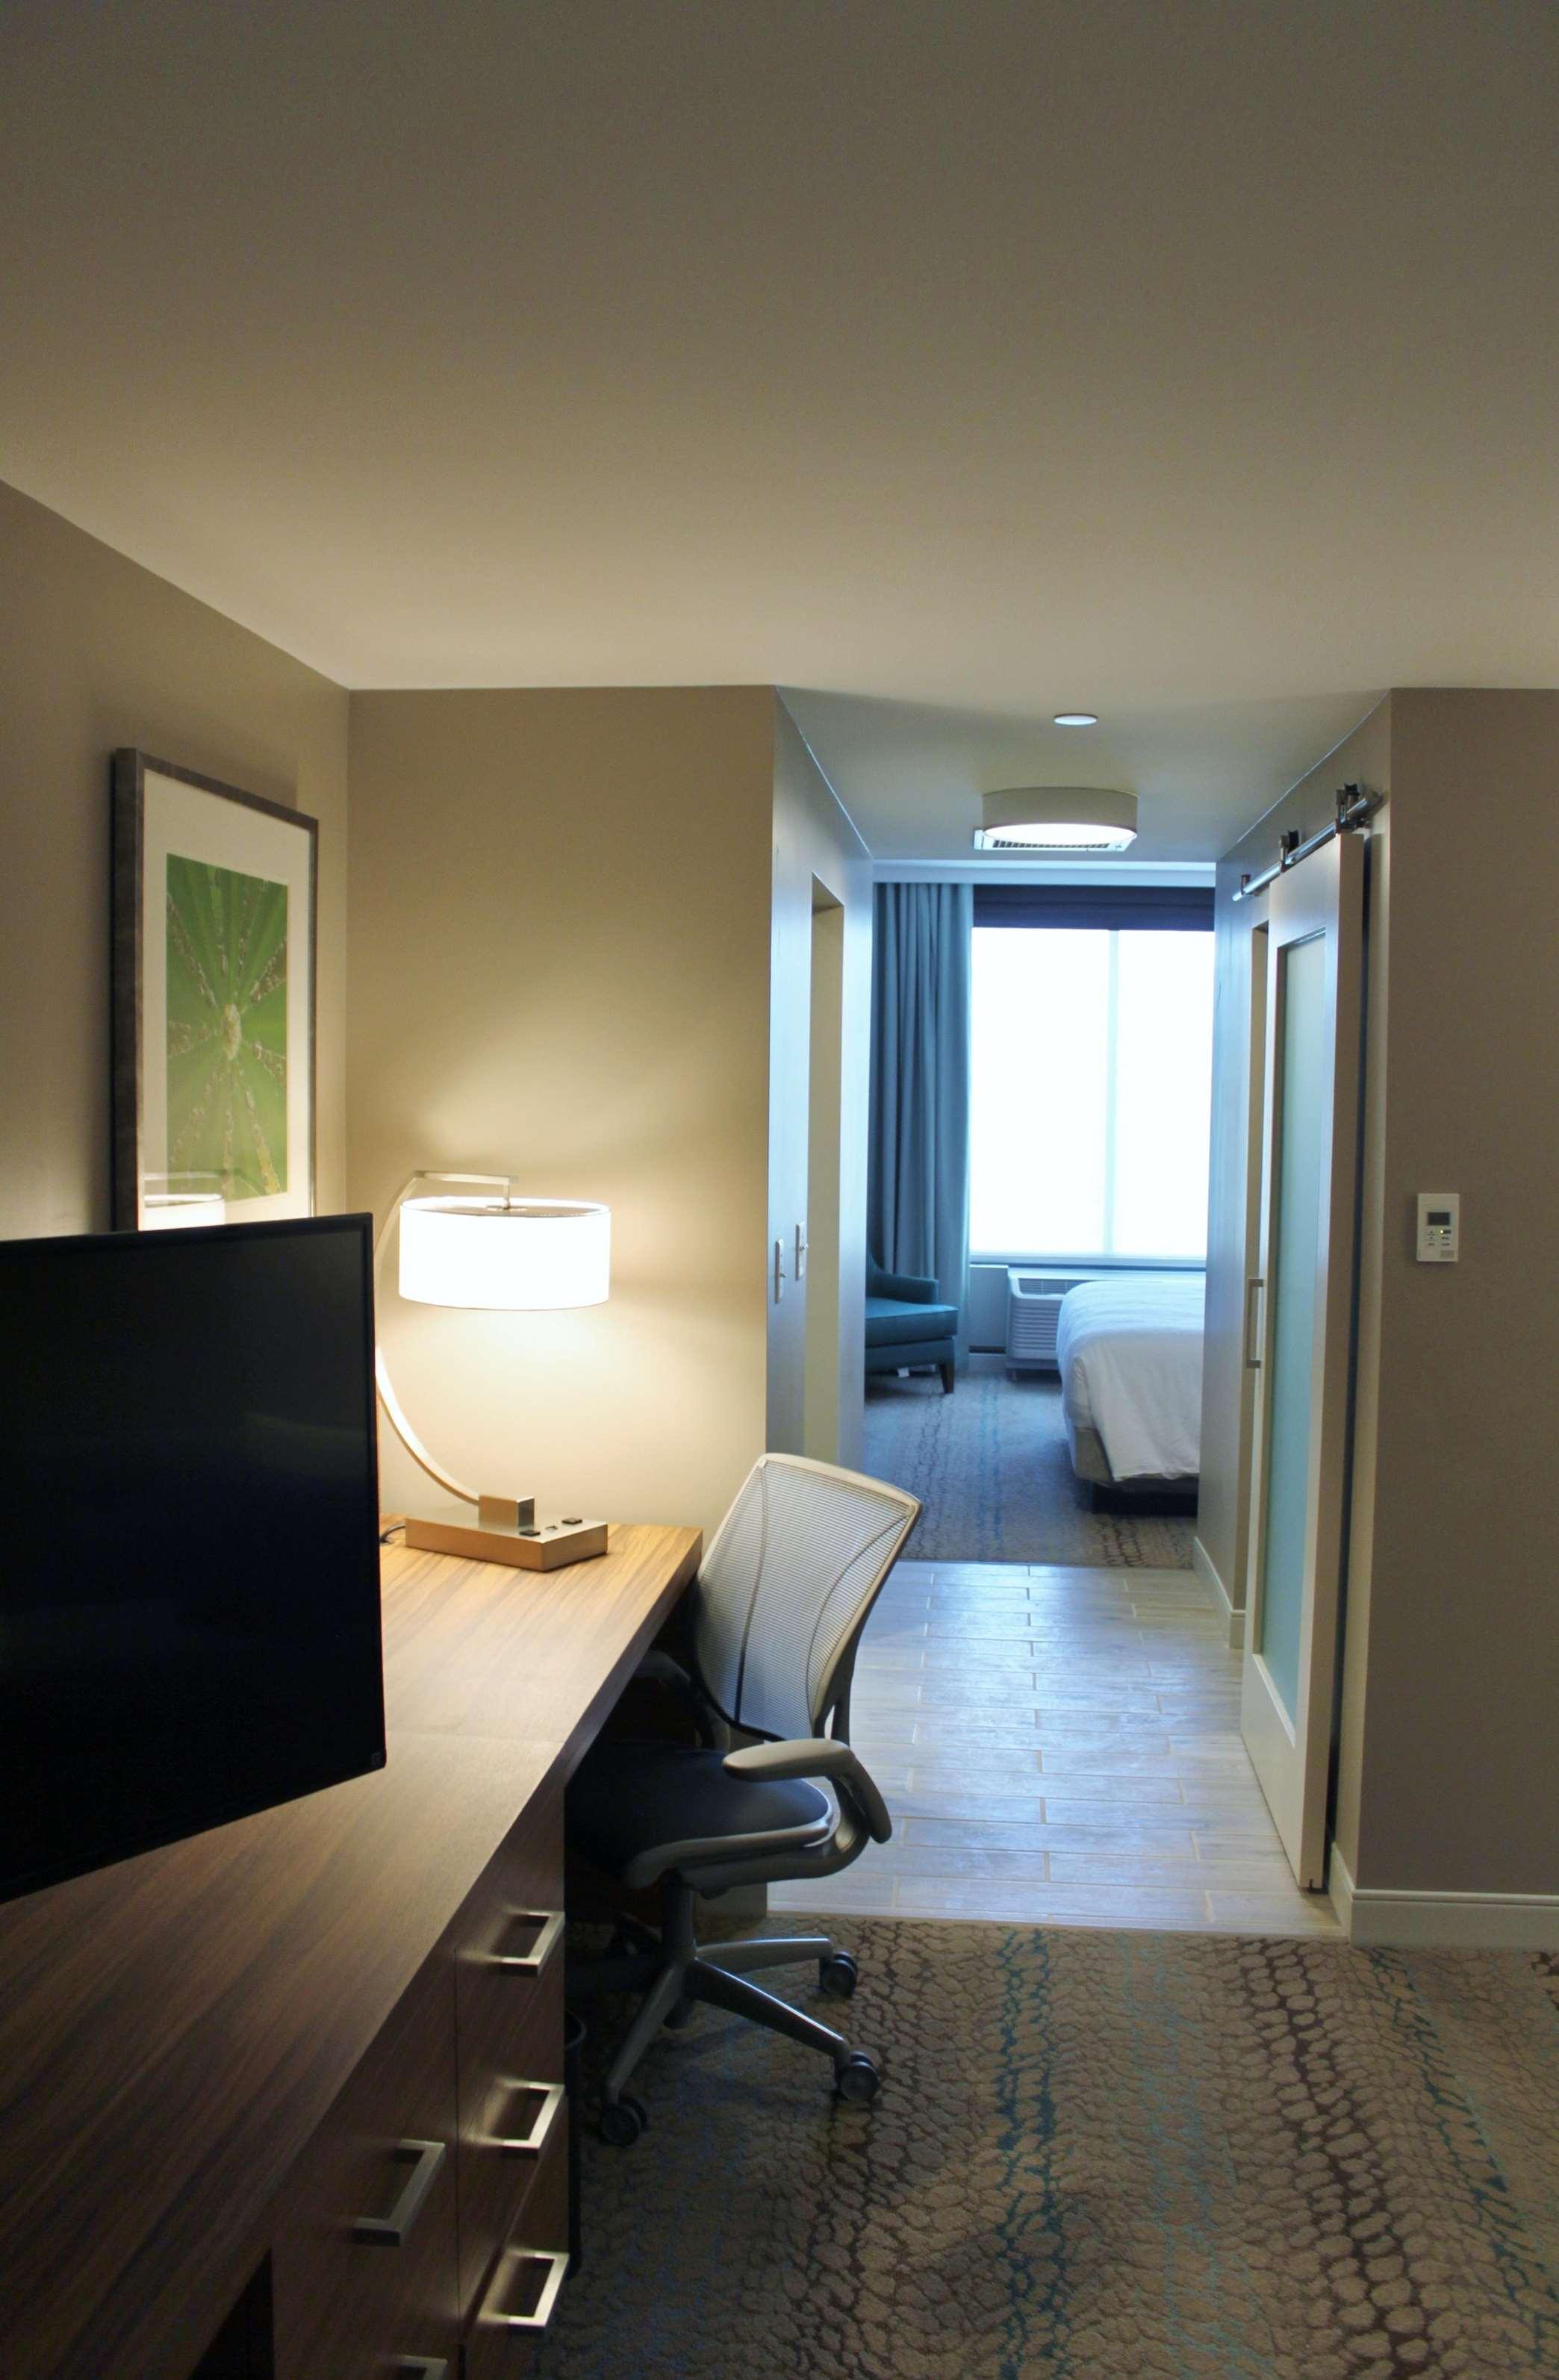 Hilton Garden Inn Boston/Marlborough image 1